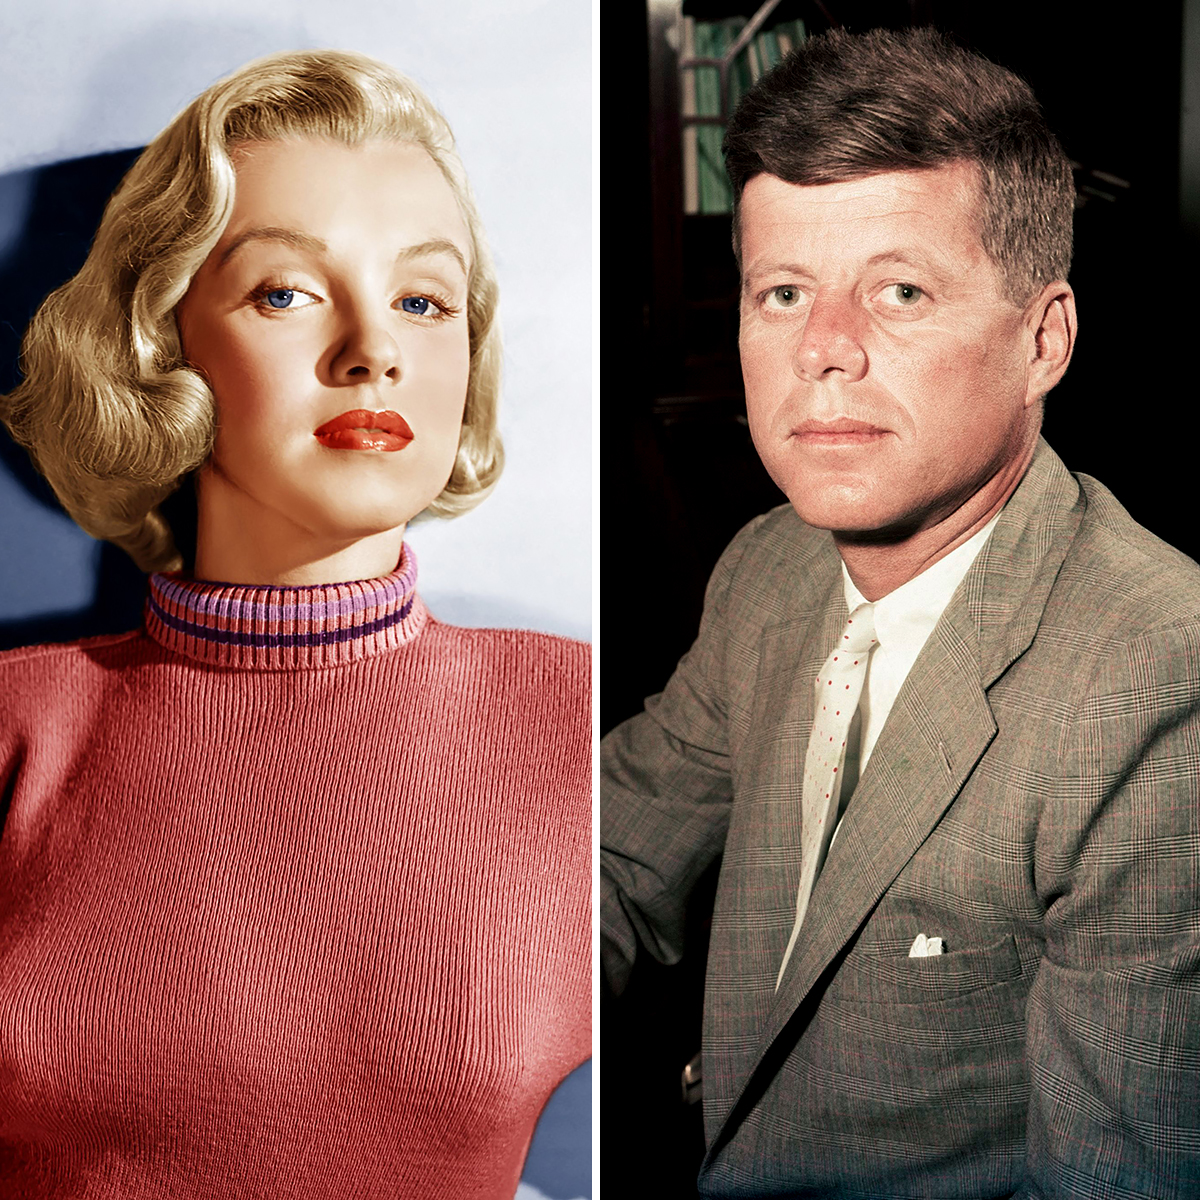 Marilyn-Monroe-Tried-to-Hurt-JFK's-Re-election-Bid